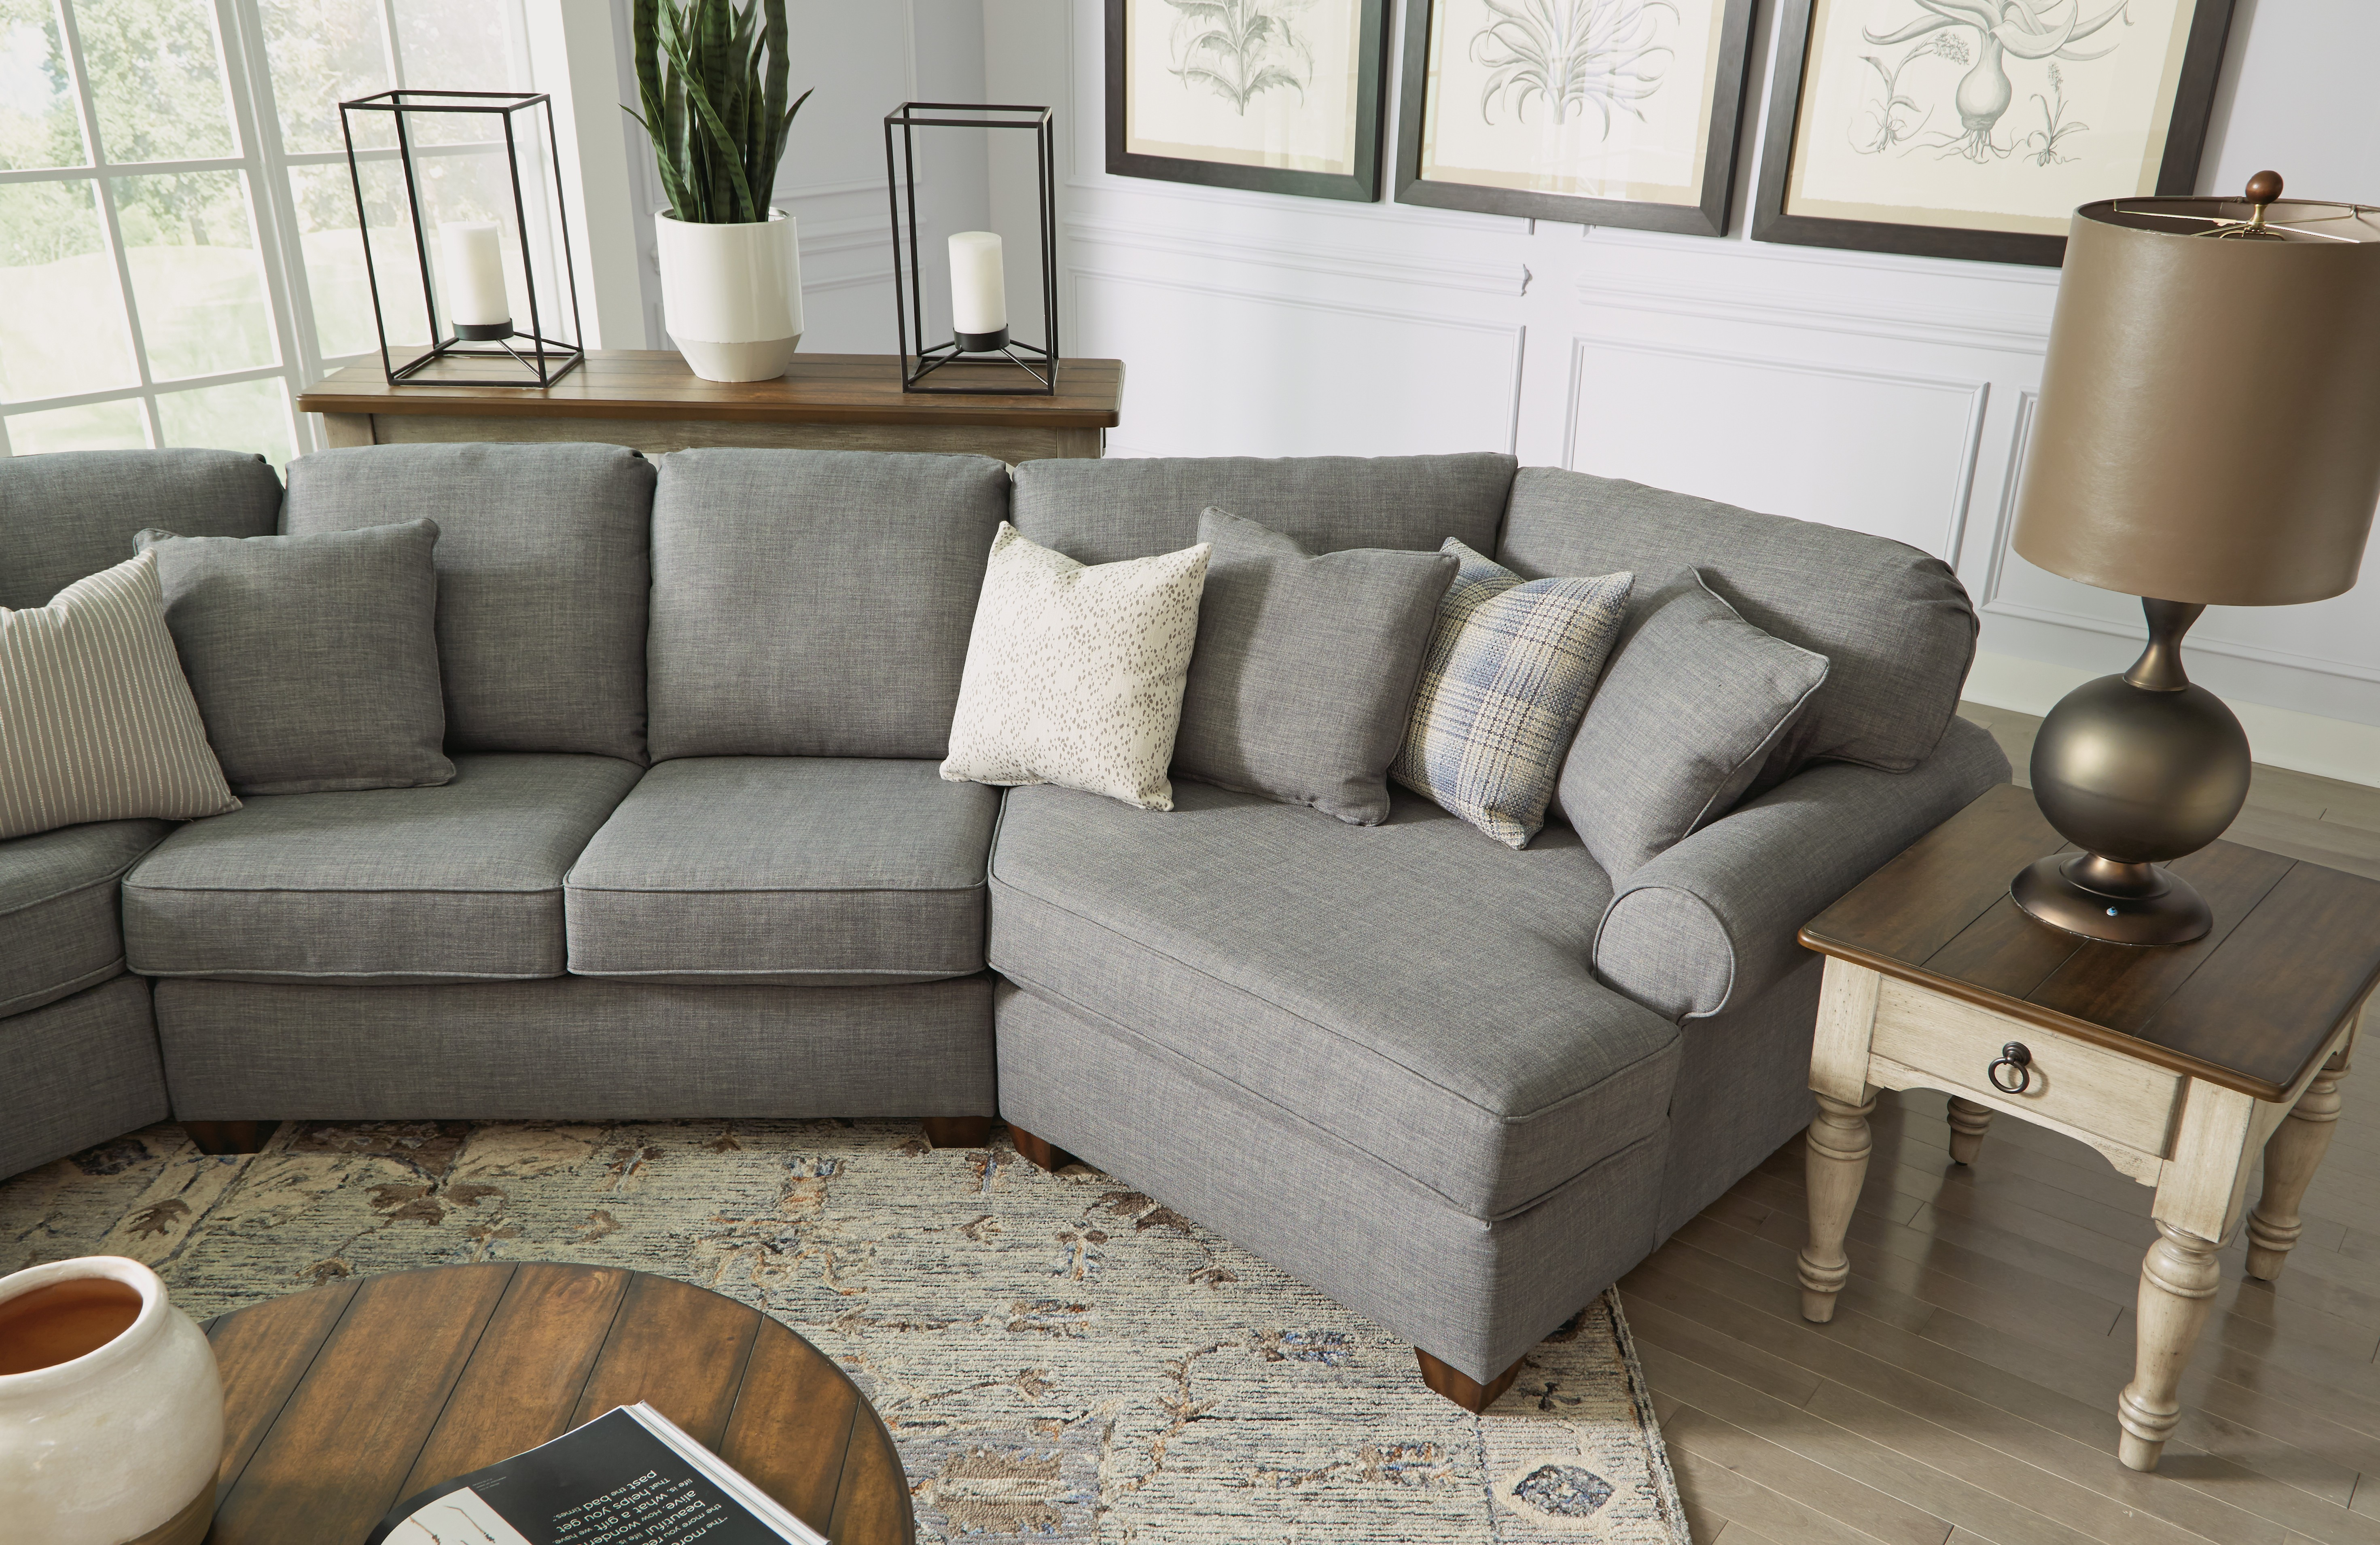 Crowley Furniture & Mattress  LinkedIn